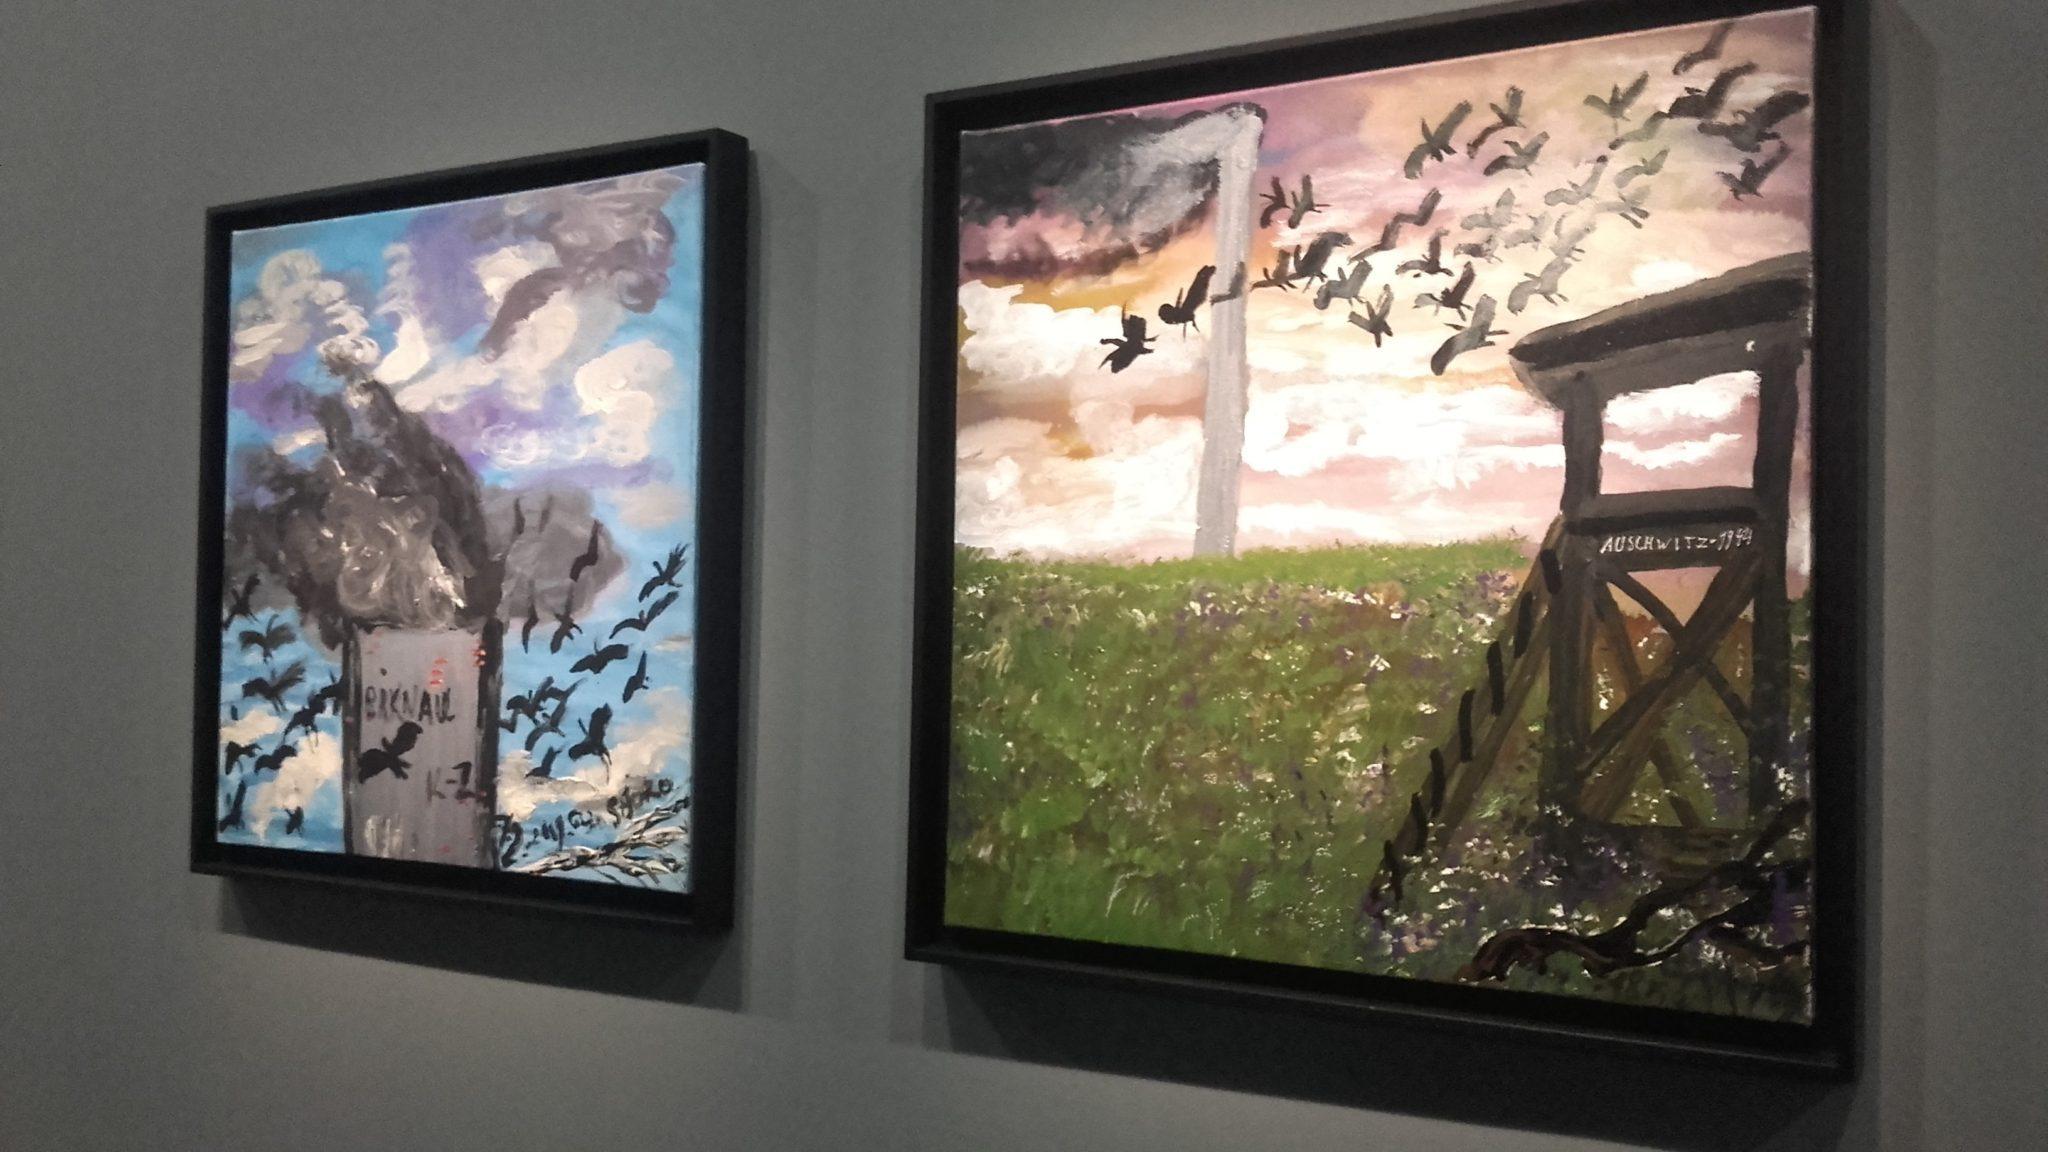 Exposition Ceija Stojka (1933-2013) une artiste rom dans le siècle image 2